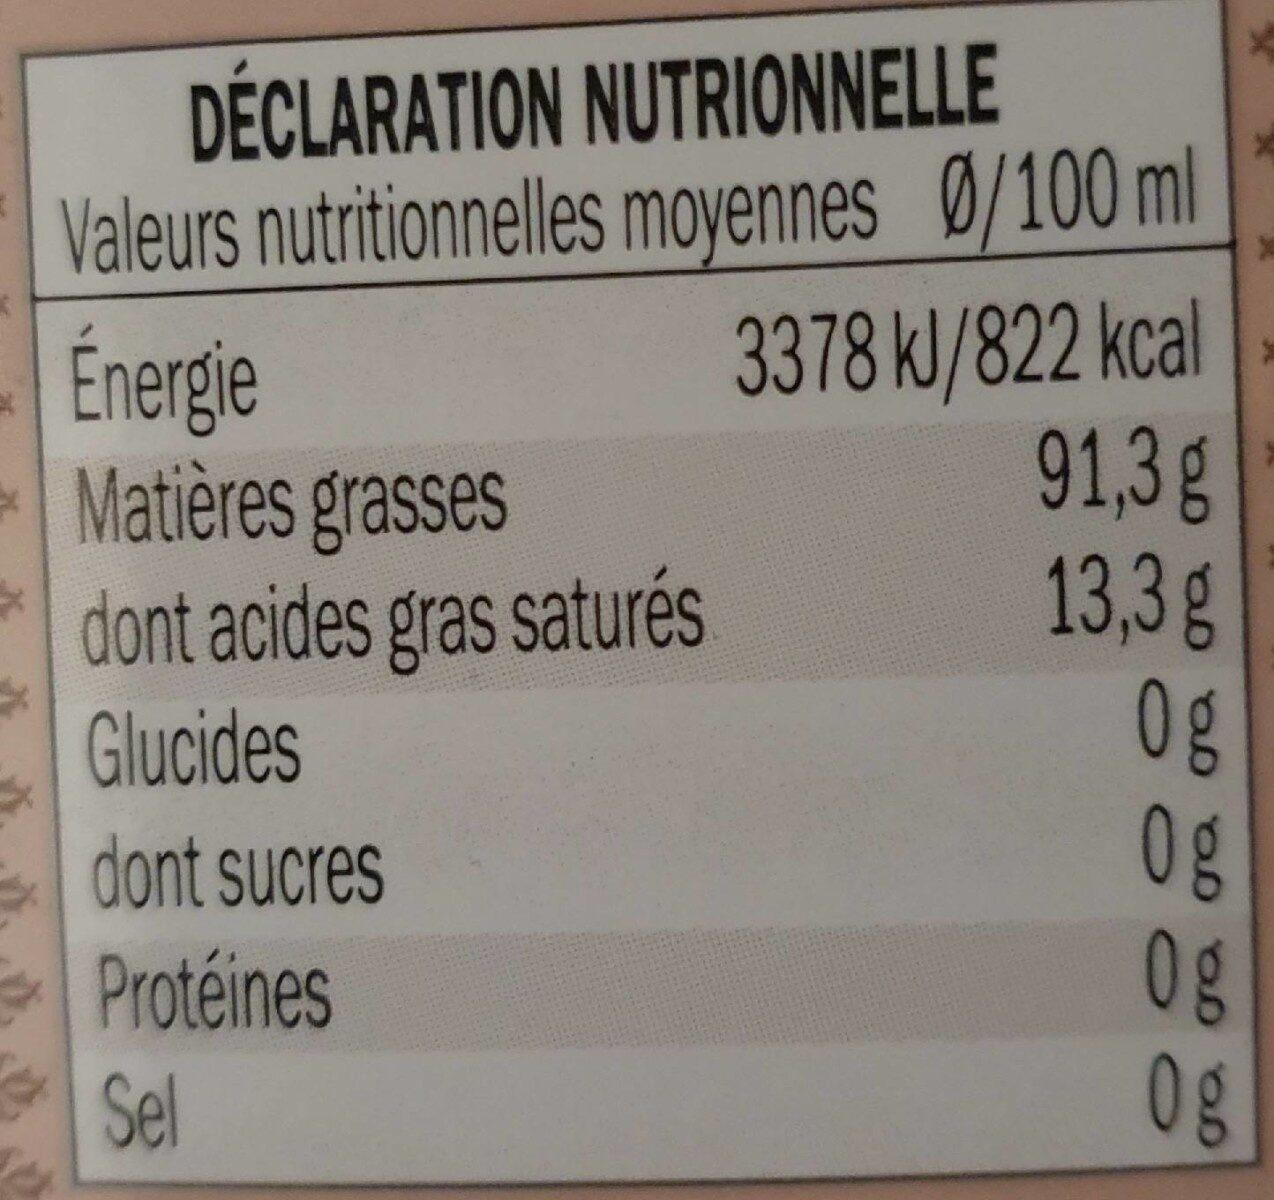 Extra Virgin Olive Oil - Nutrition facts - en